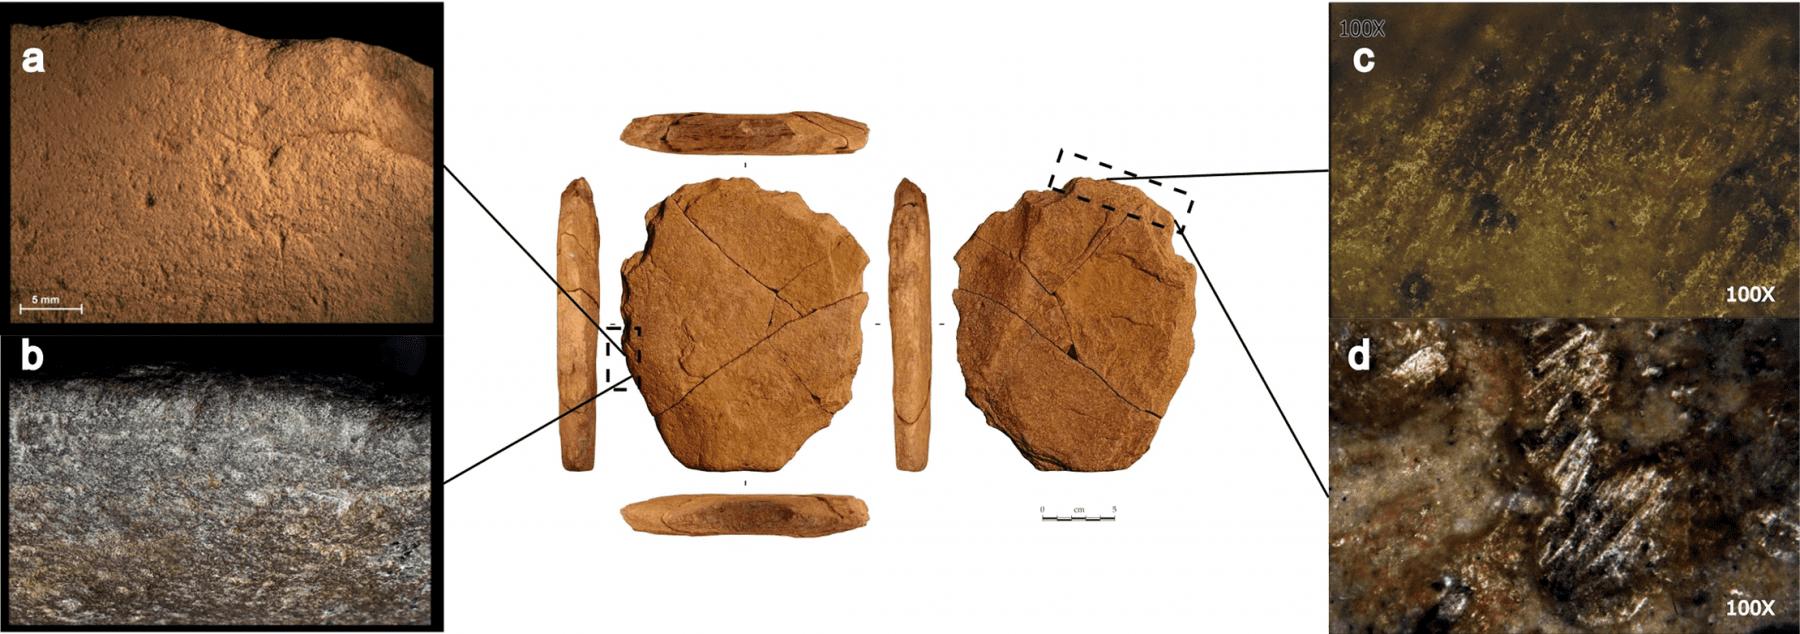 Traceological analysis of the stone artifact. Credit: Eric Boëda